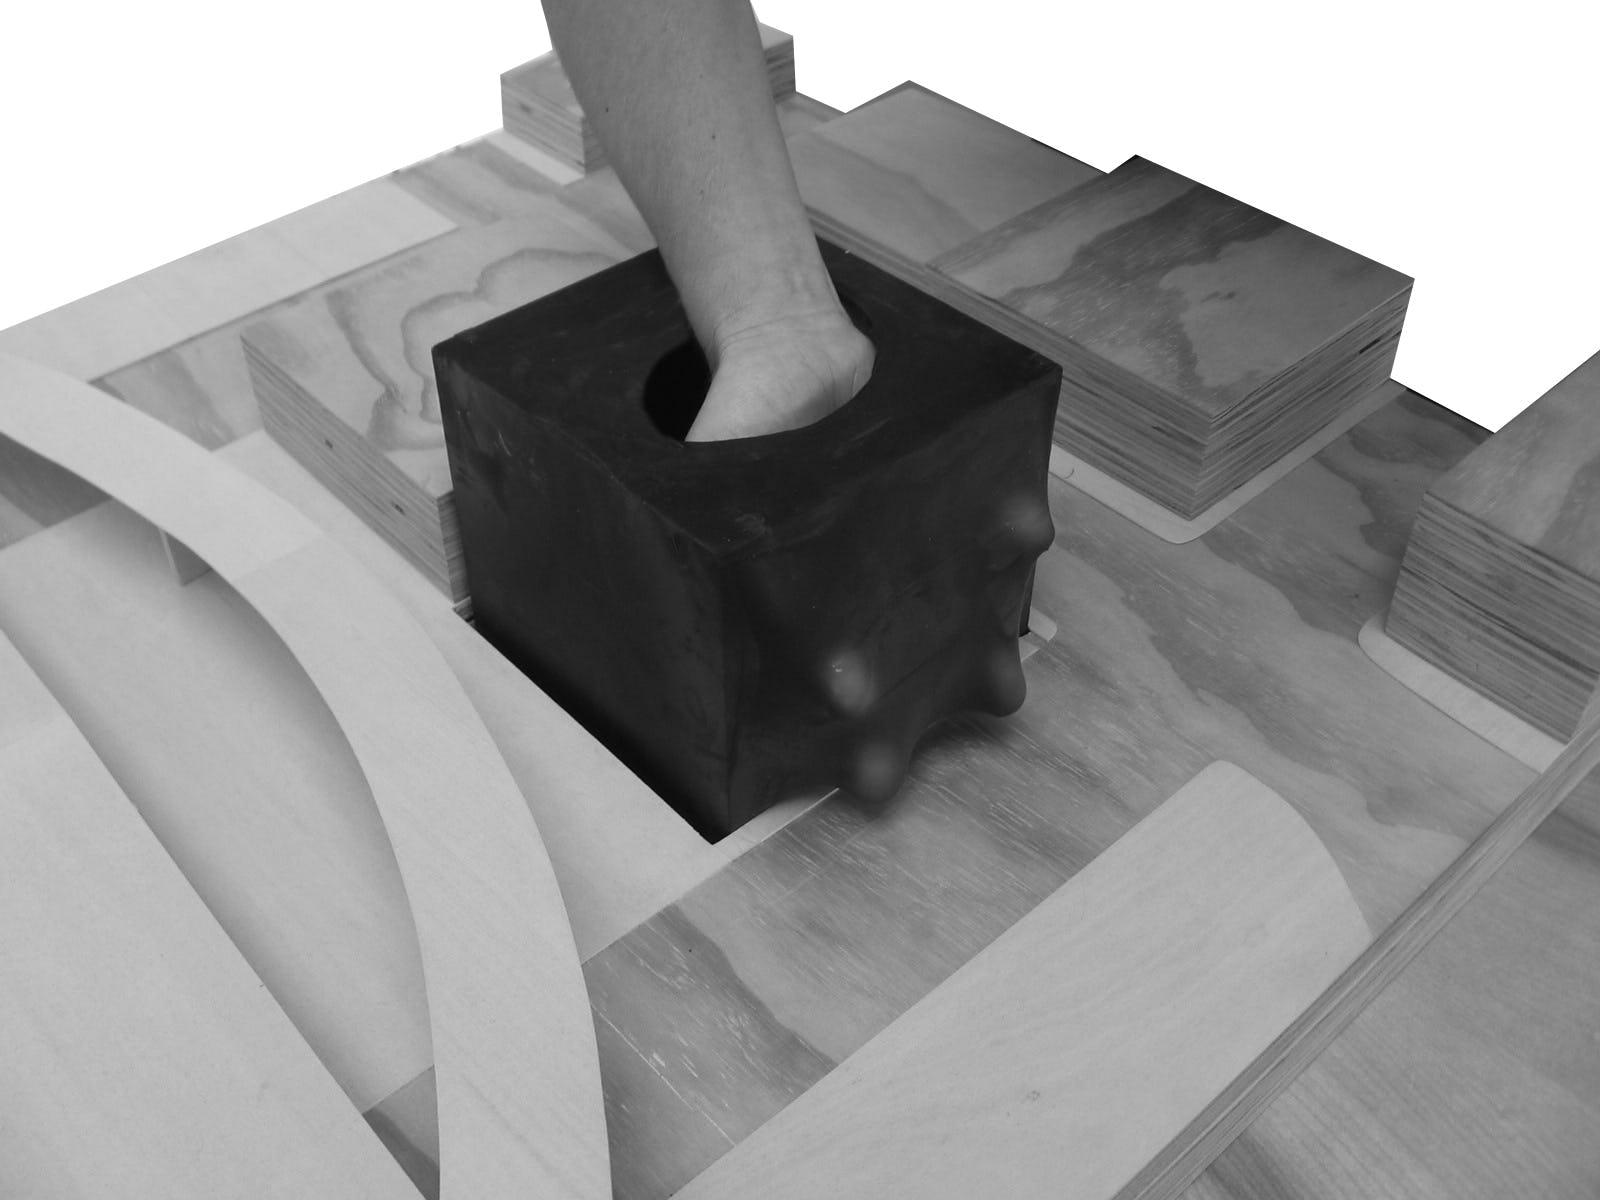 Hand stretch model